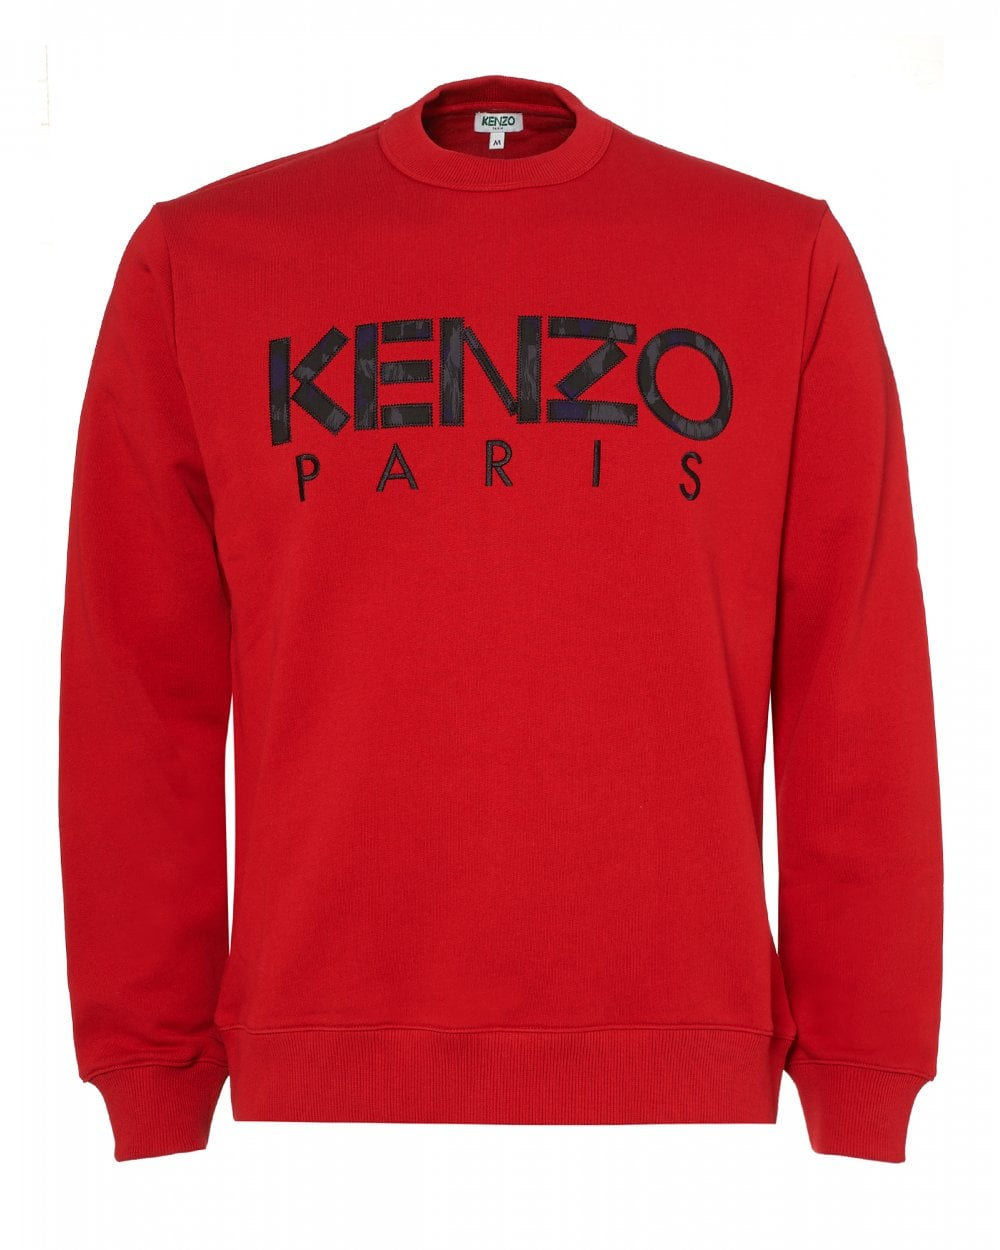 ad96be3354de Kenzo Mens Paris Logo Sweatshirt, Red Regular Fit Sweat